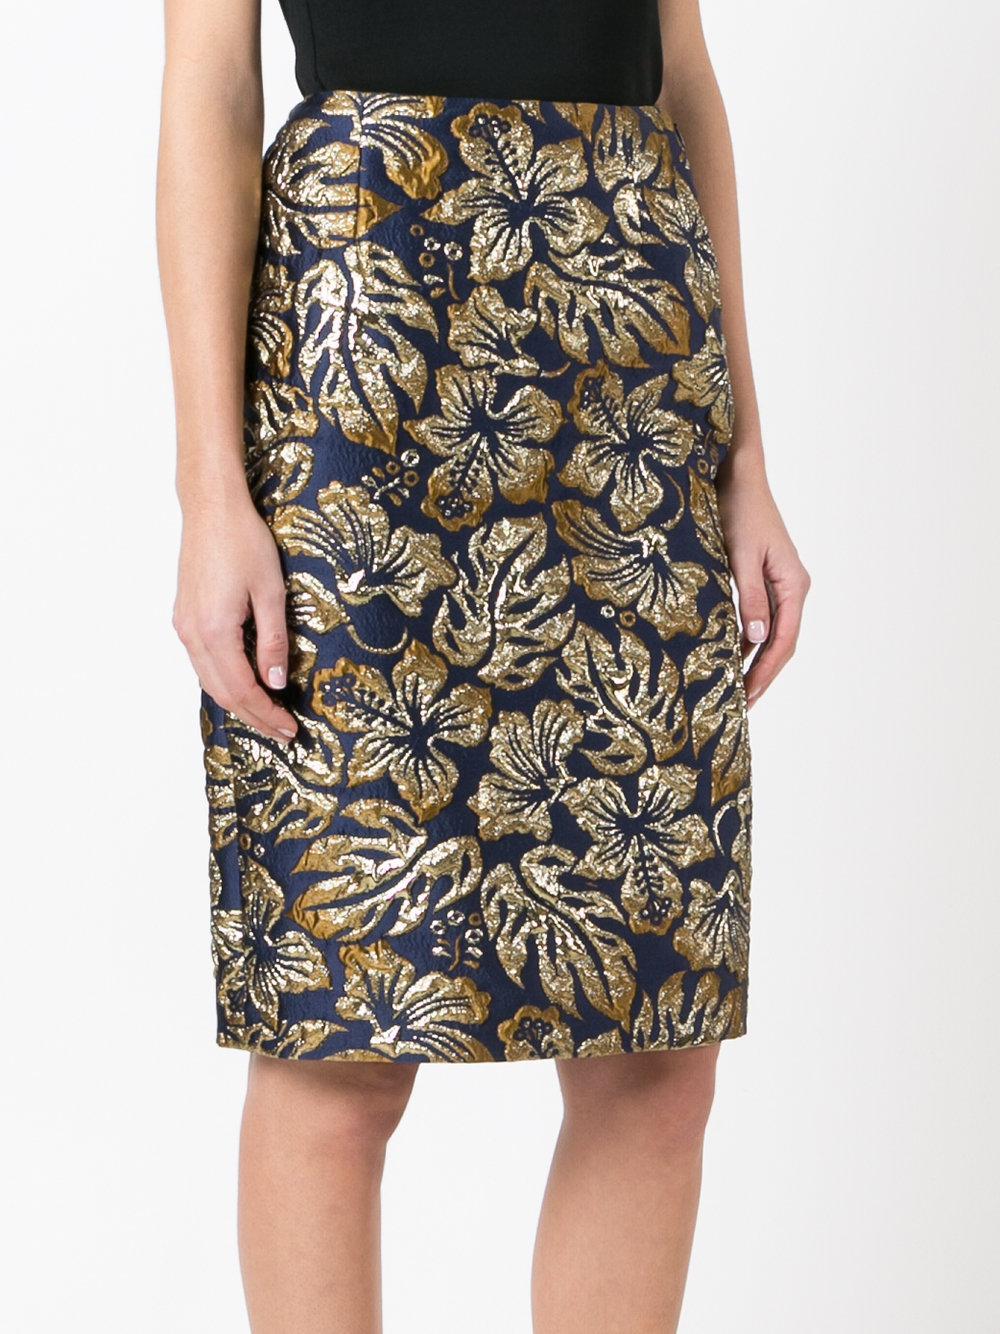 77357fdde Prada Brocade Midi Skirt in Blue - Lyst